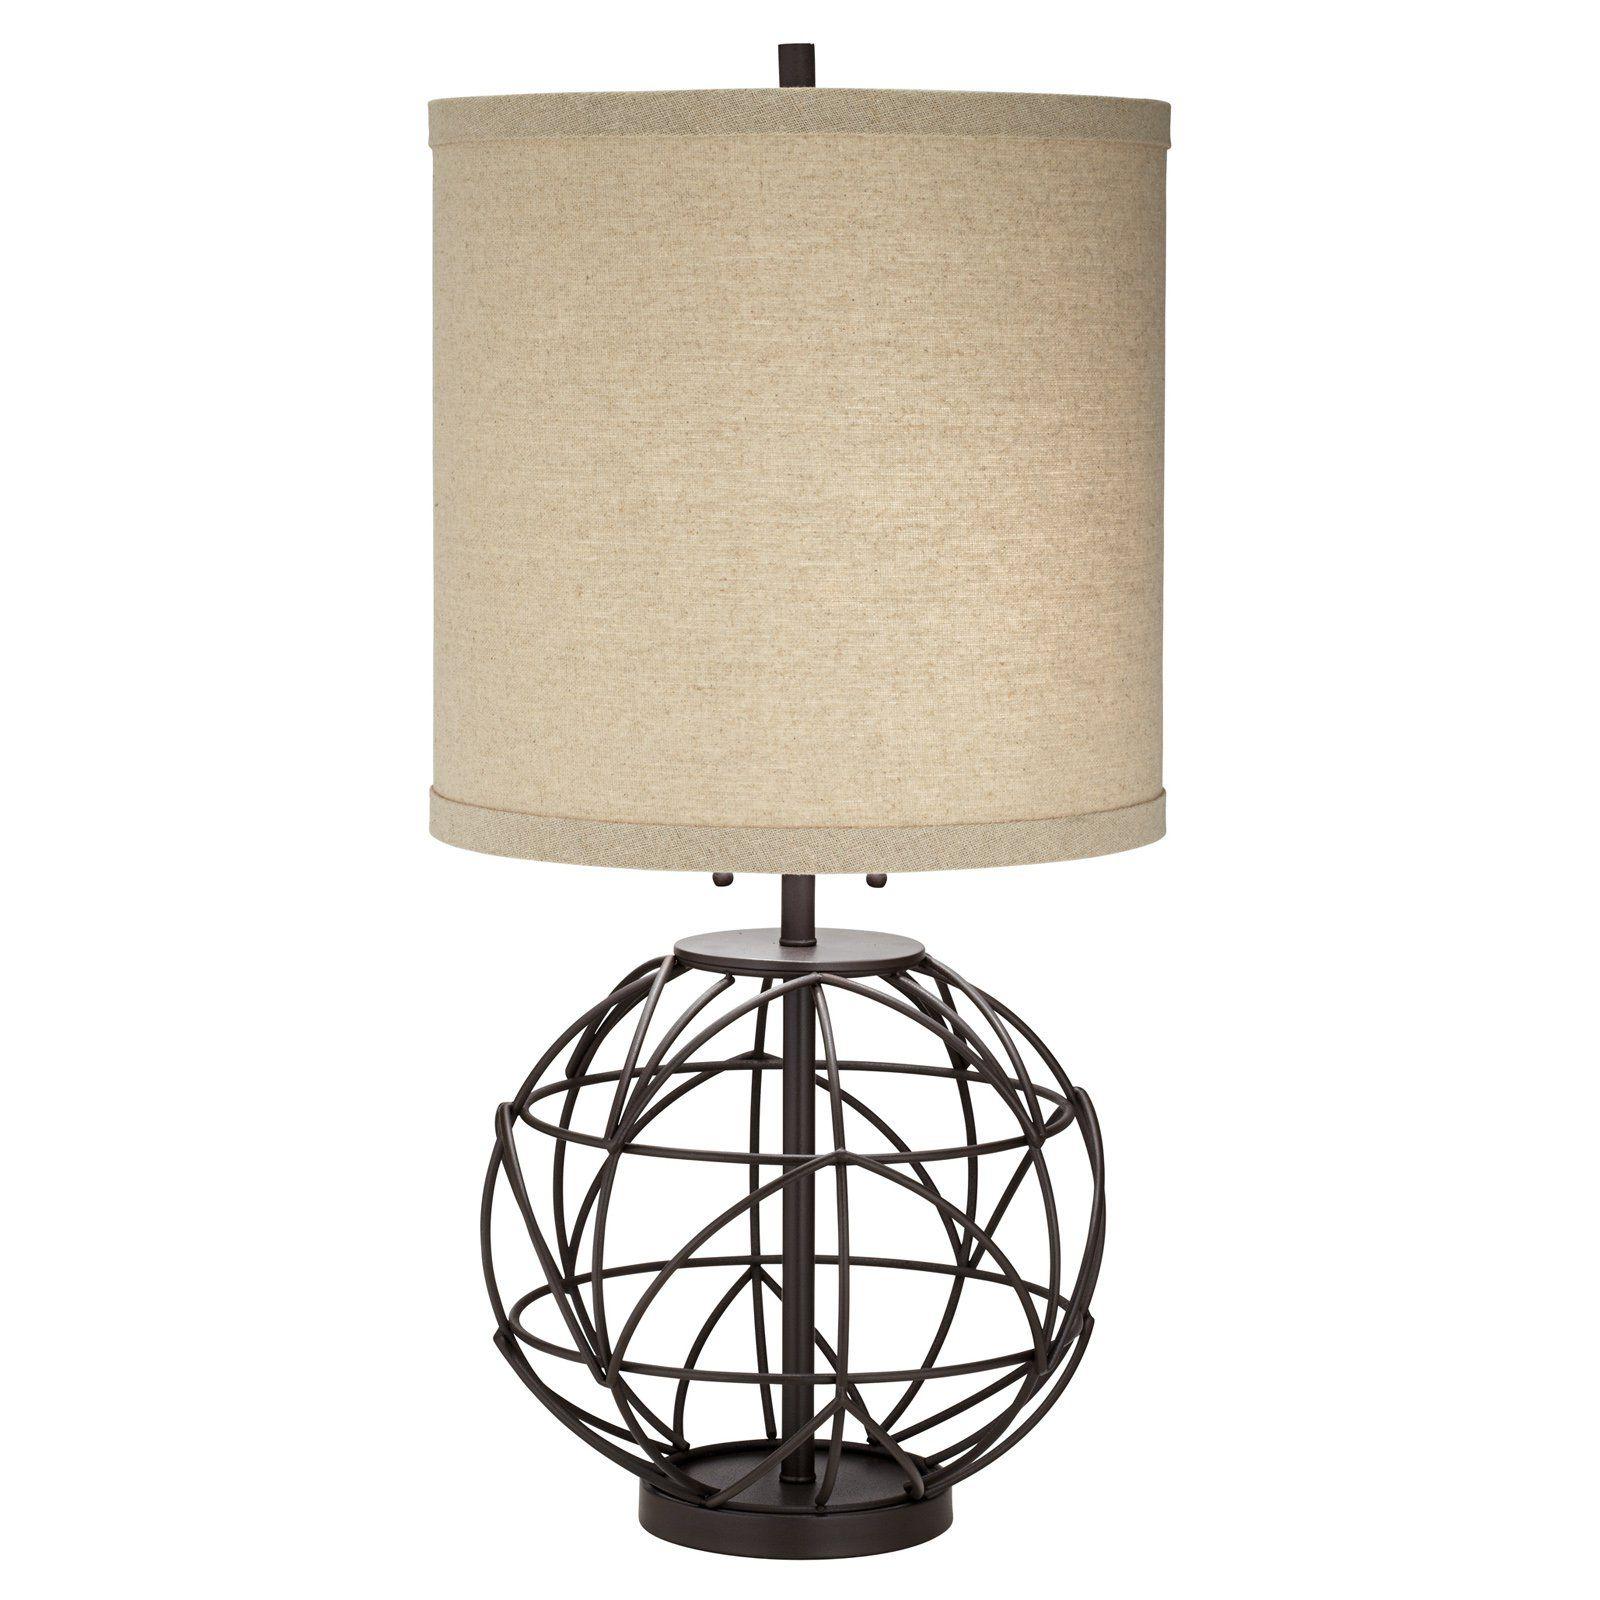 Pacific Coast Lighting Alloy Globe Table Lamp   from hayneedle.com ...